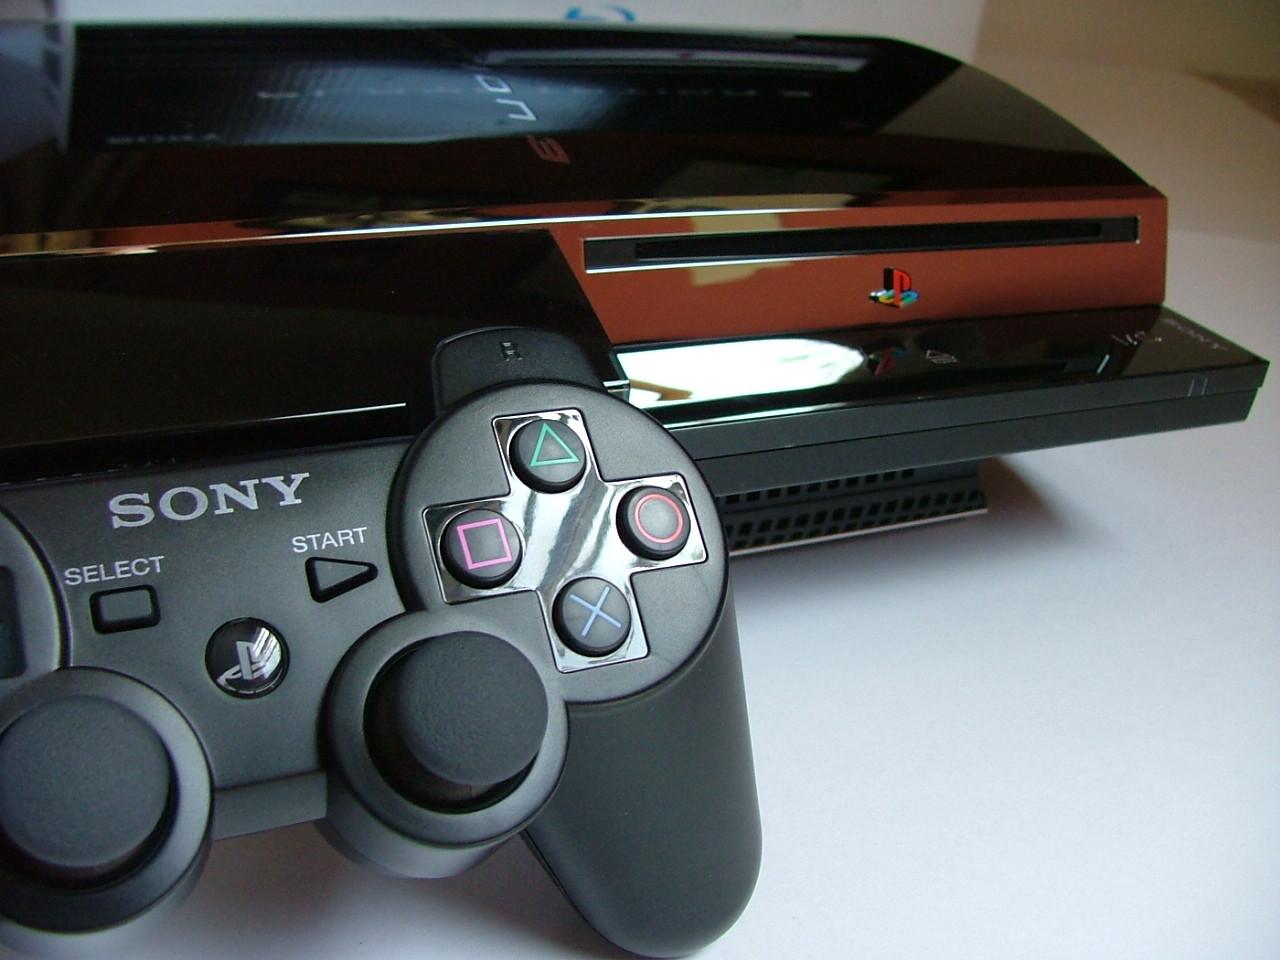 "<p>Фото: © <a href=""https://ru.wikipedia.org/wiki/%D0%A4%D0%B0%D0%B9%D0%BB:Playstation_3_and_controller.jpg"" target=""_self"">Википедия</a></p>"